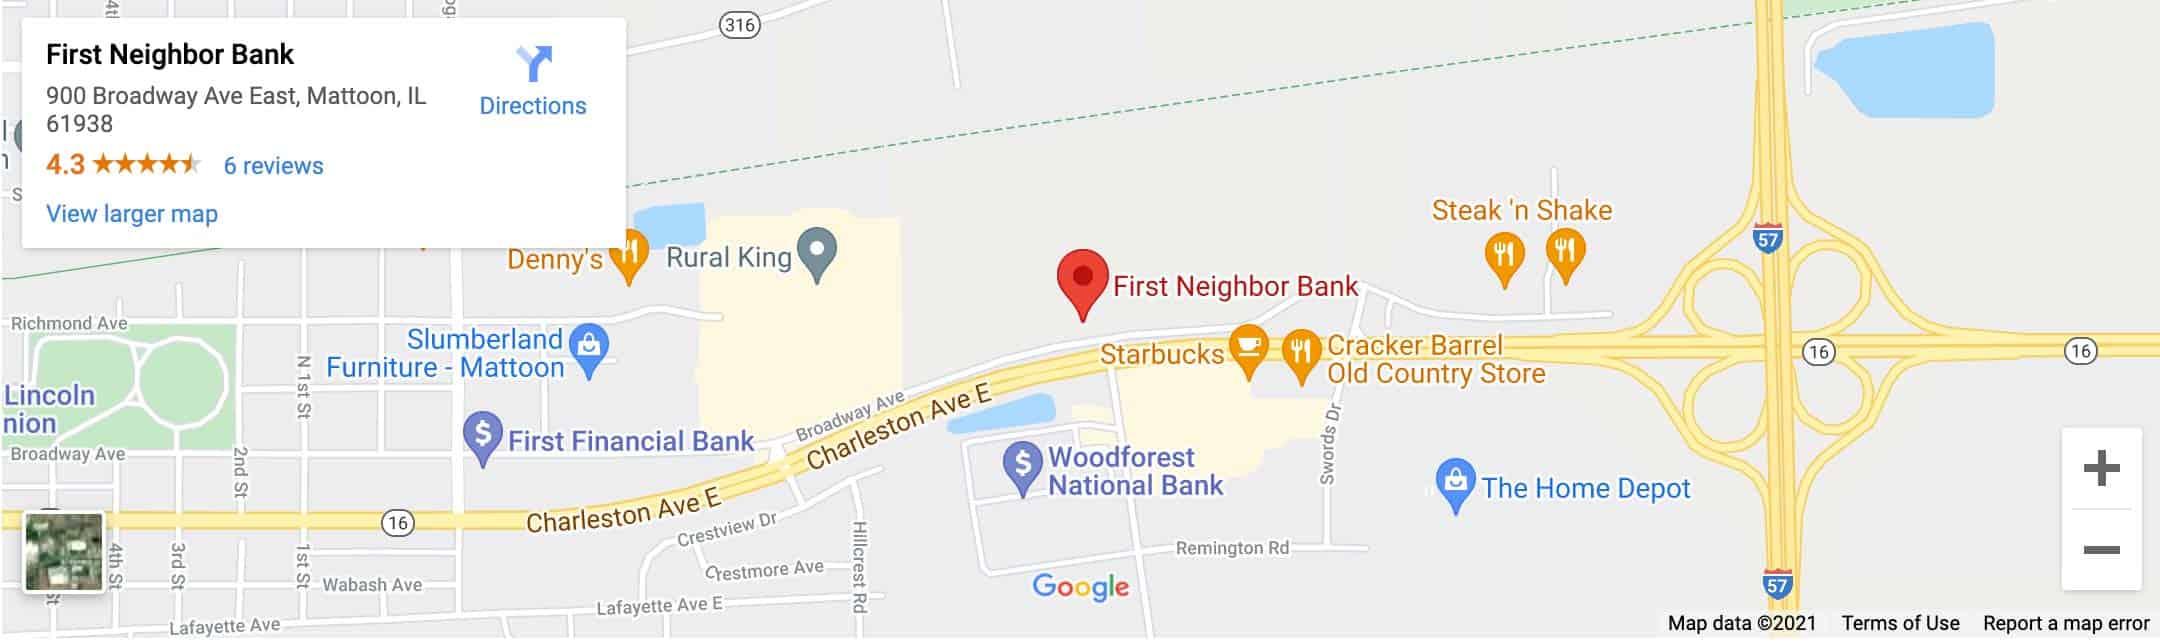 Decorative - First Neighbor Bank Mattoon Google Map Image